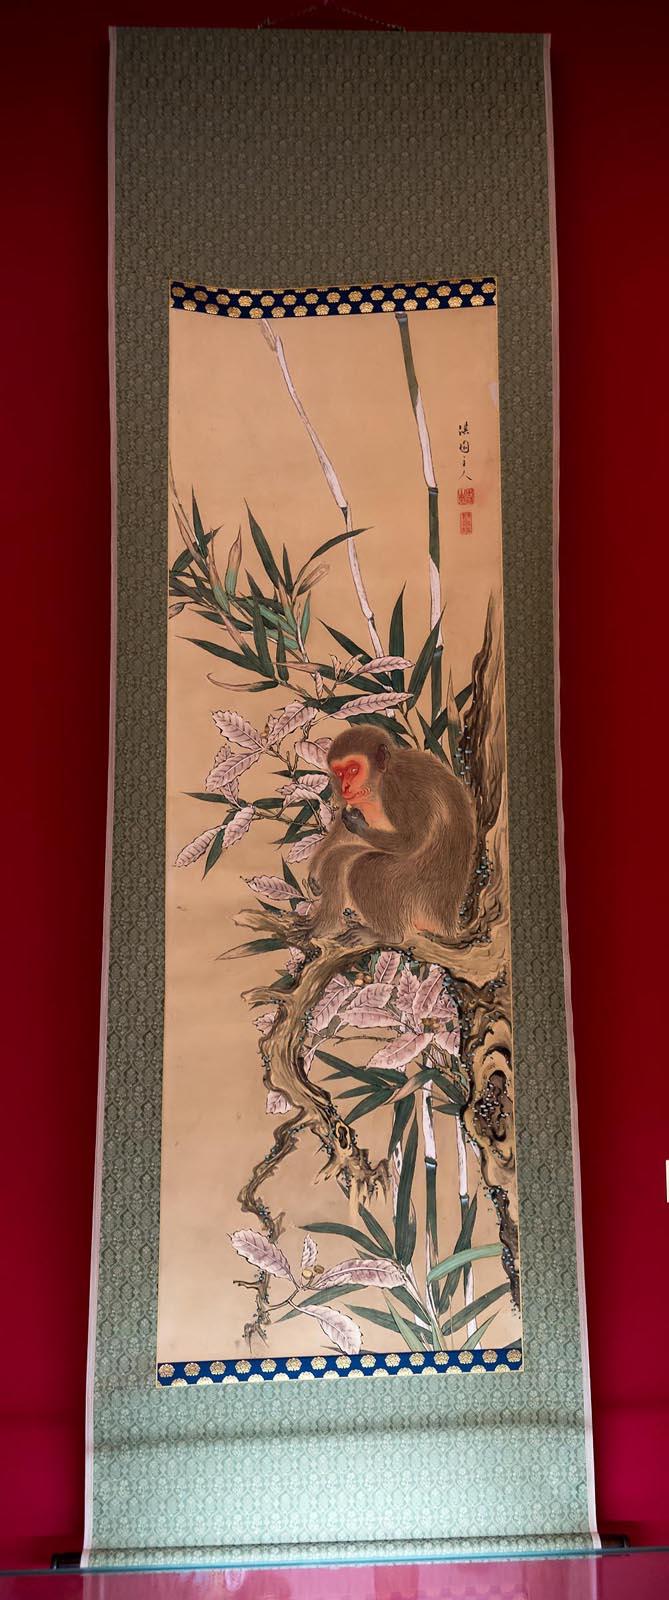 Фото №232715. Свиток «Обезьяна в зарослях бамбука»